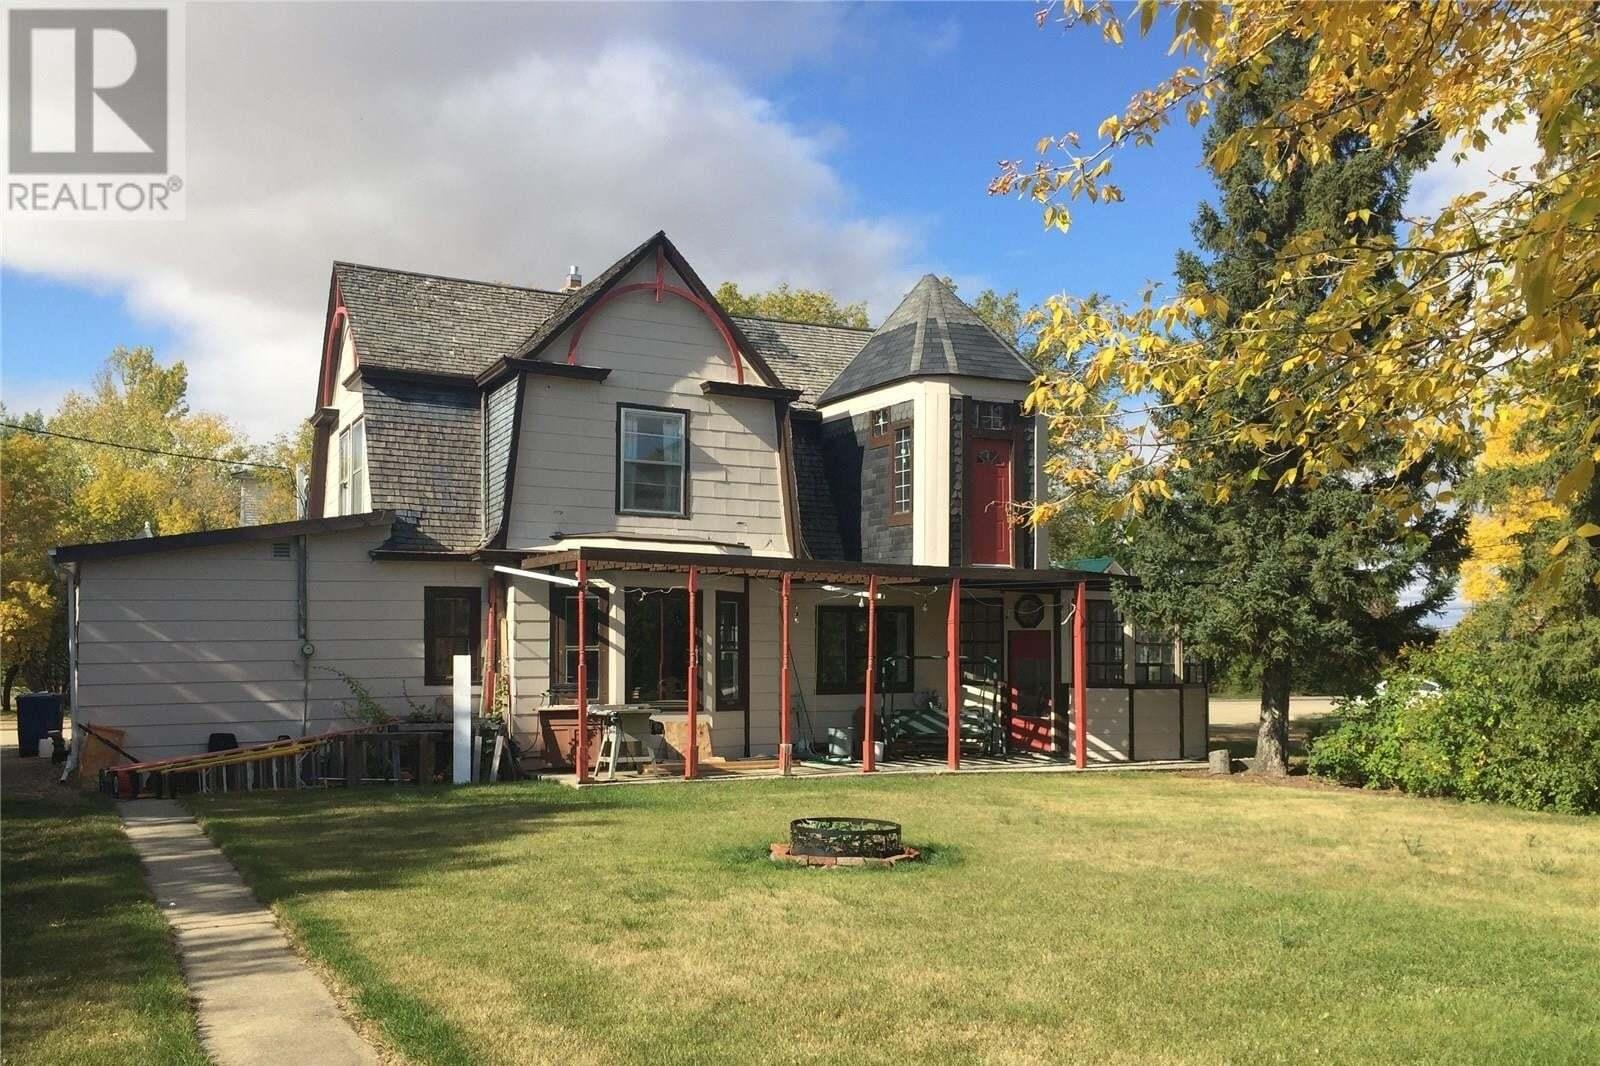 House for sale at 401 3rd St Craik Saskatchewan - MLS: SK828141